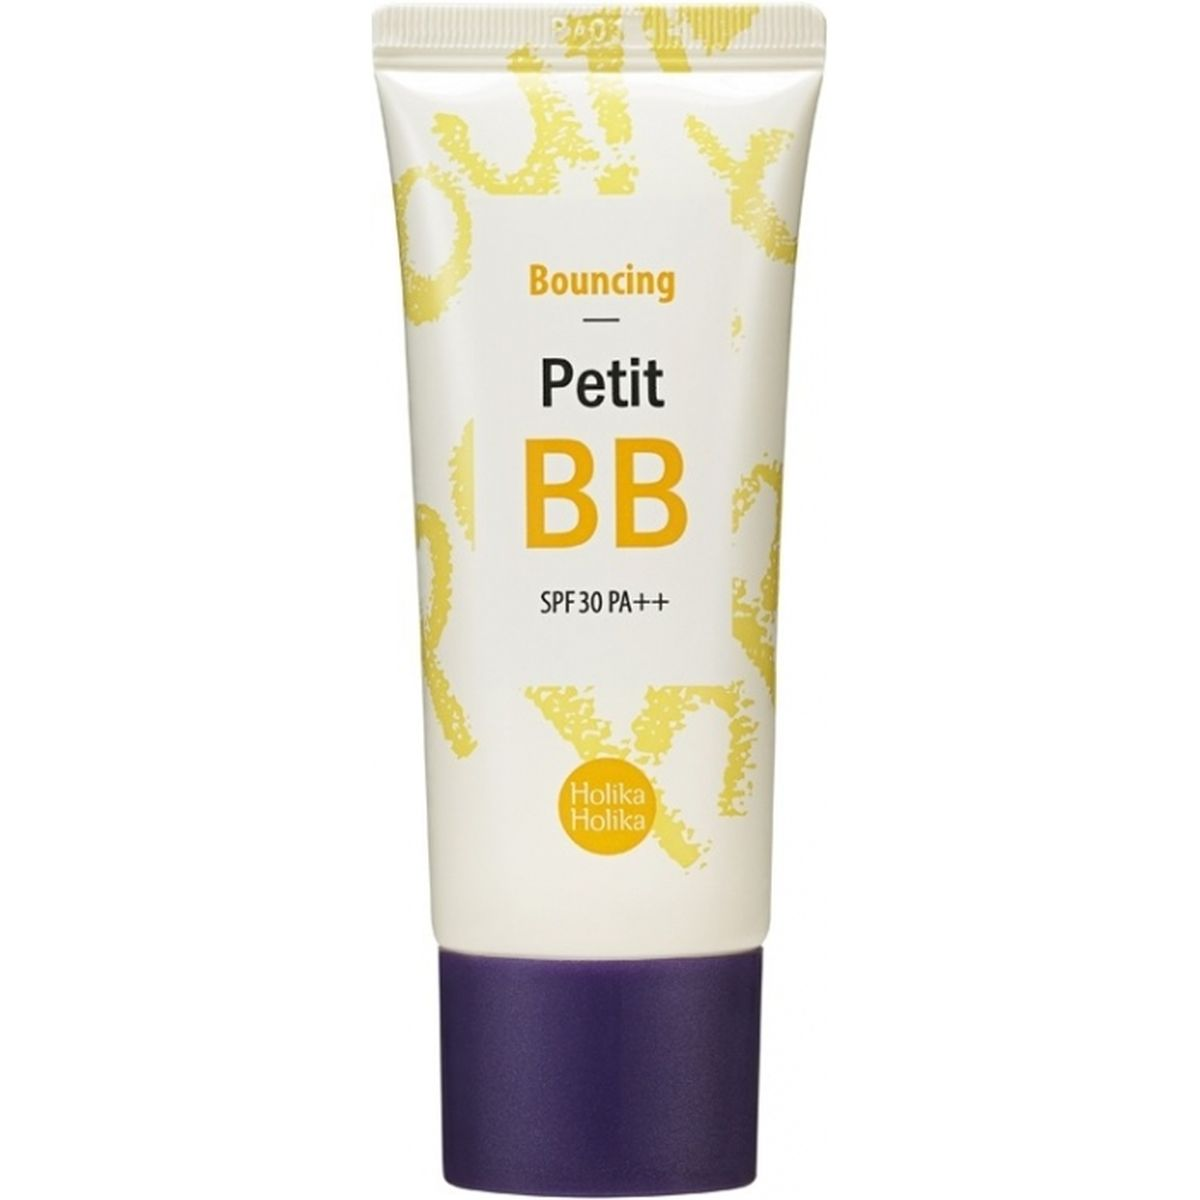 Антивозрастной ББ крем HOLIKA HOLIKA Petit Bouncing BB Cream SPF 30 PA++ - 30 мл